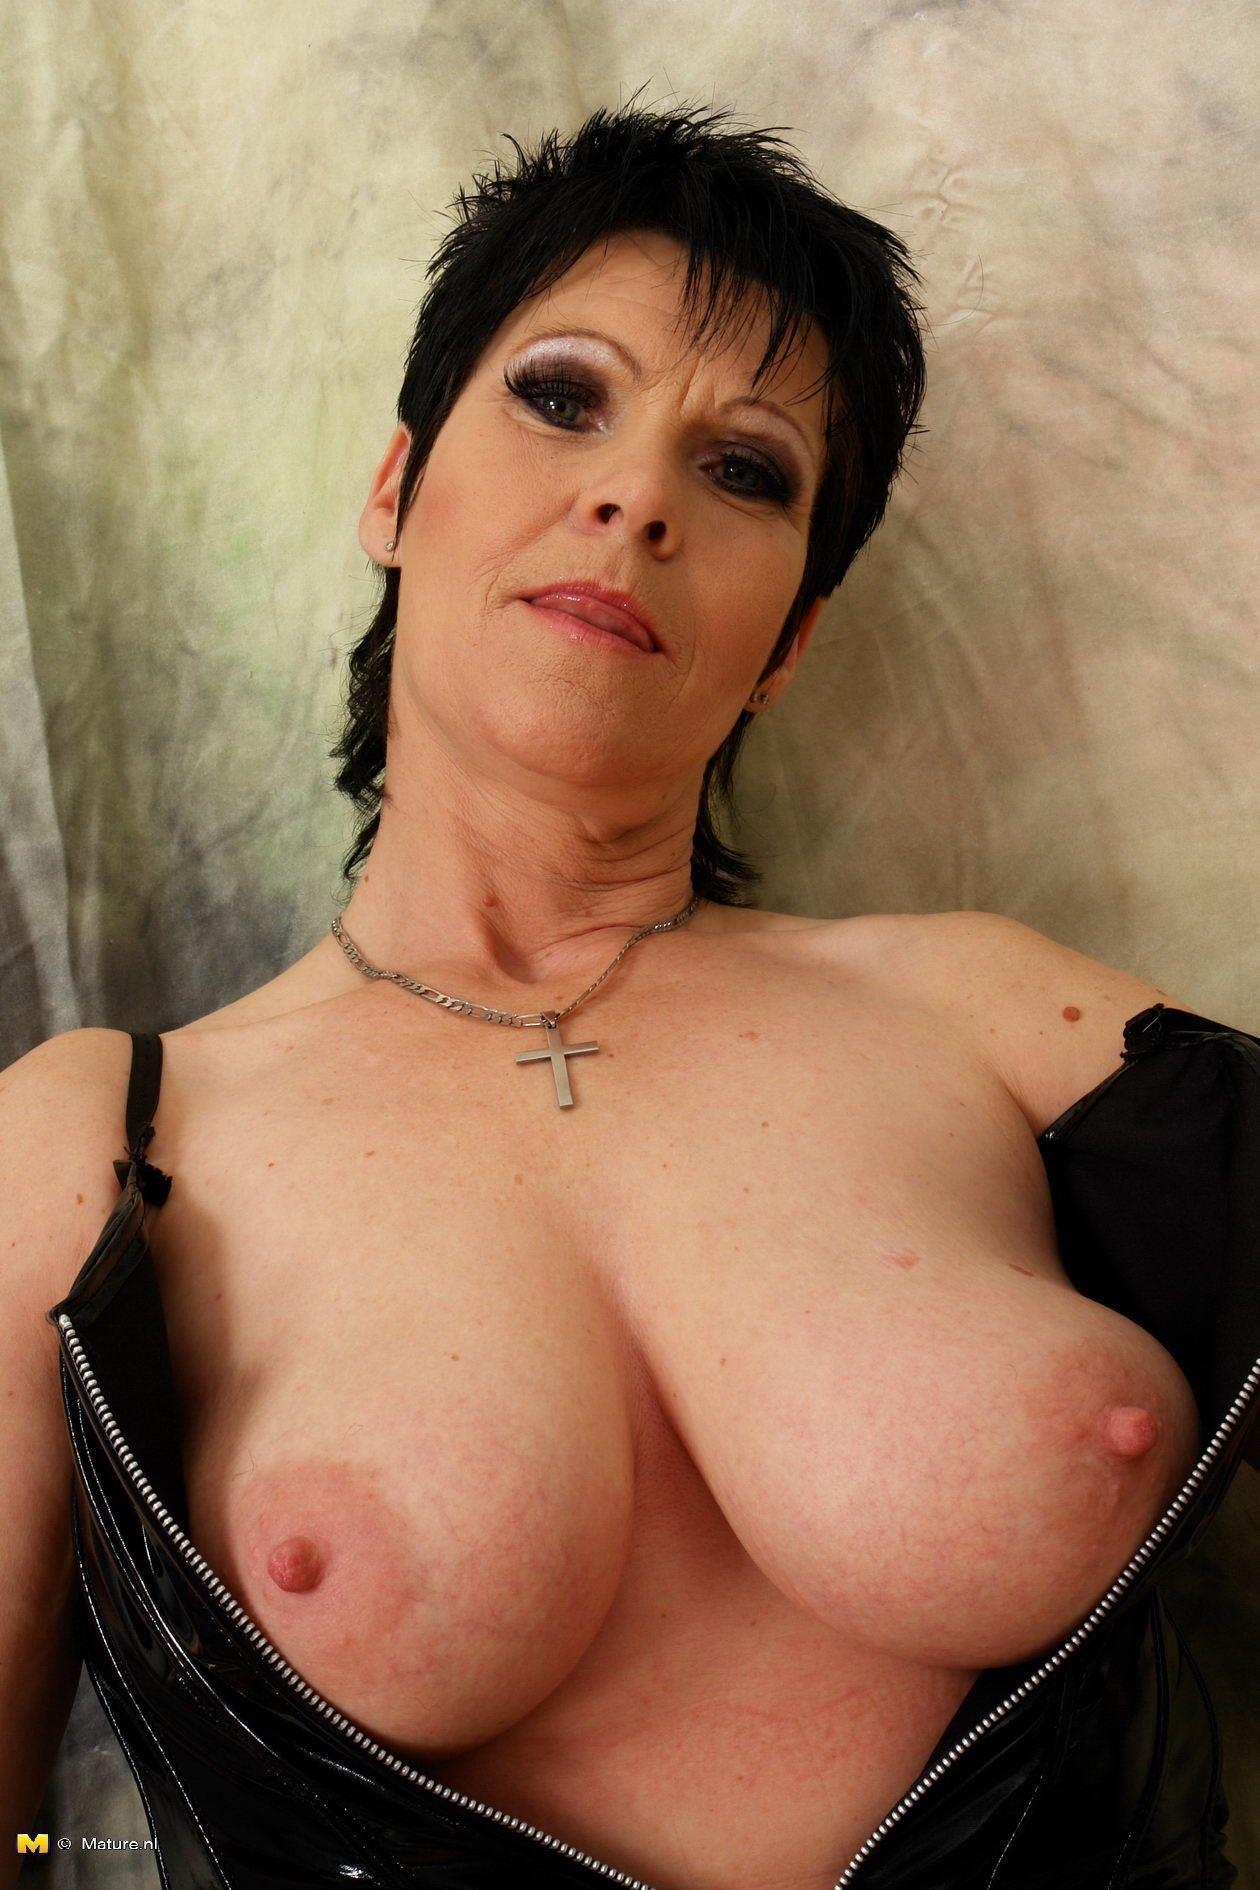 Stargazer reccomend Mature amateur topheavy women tits boobs